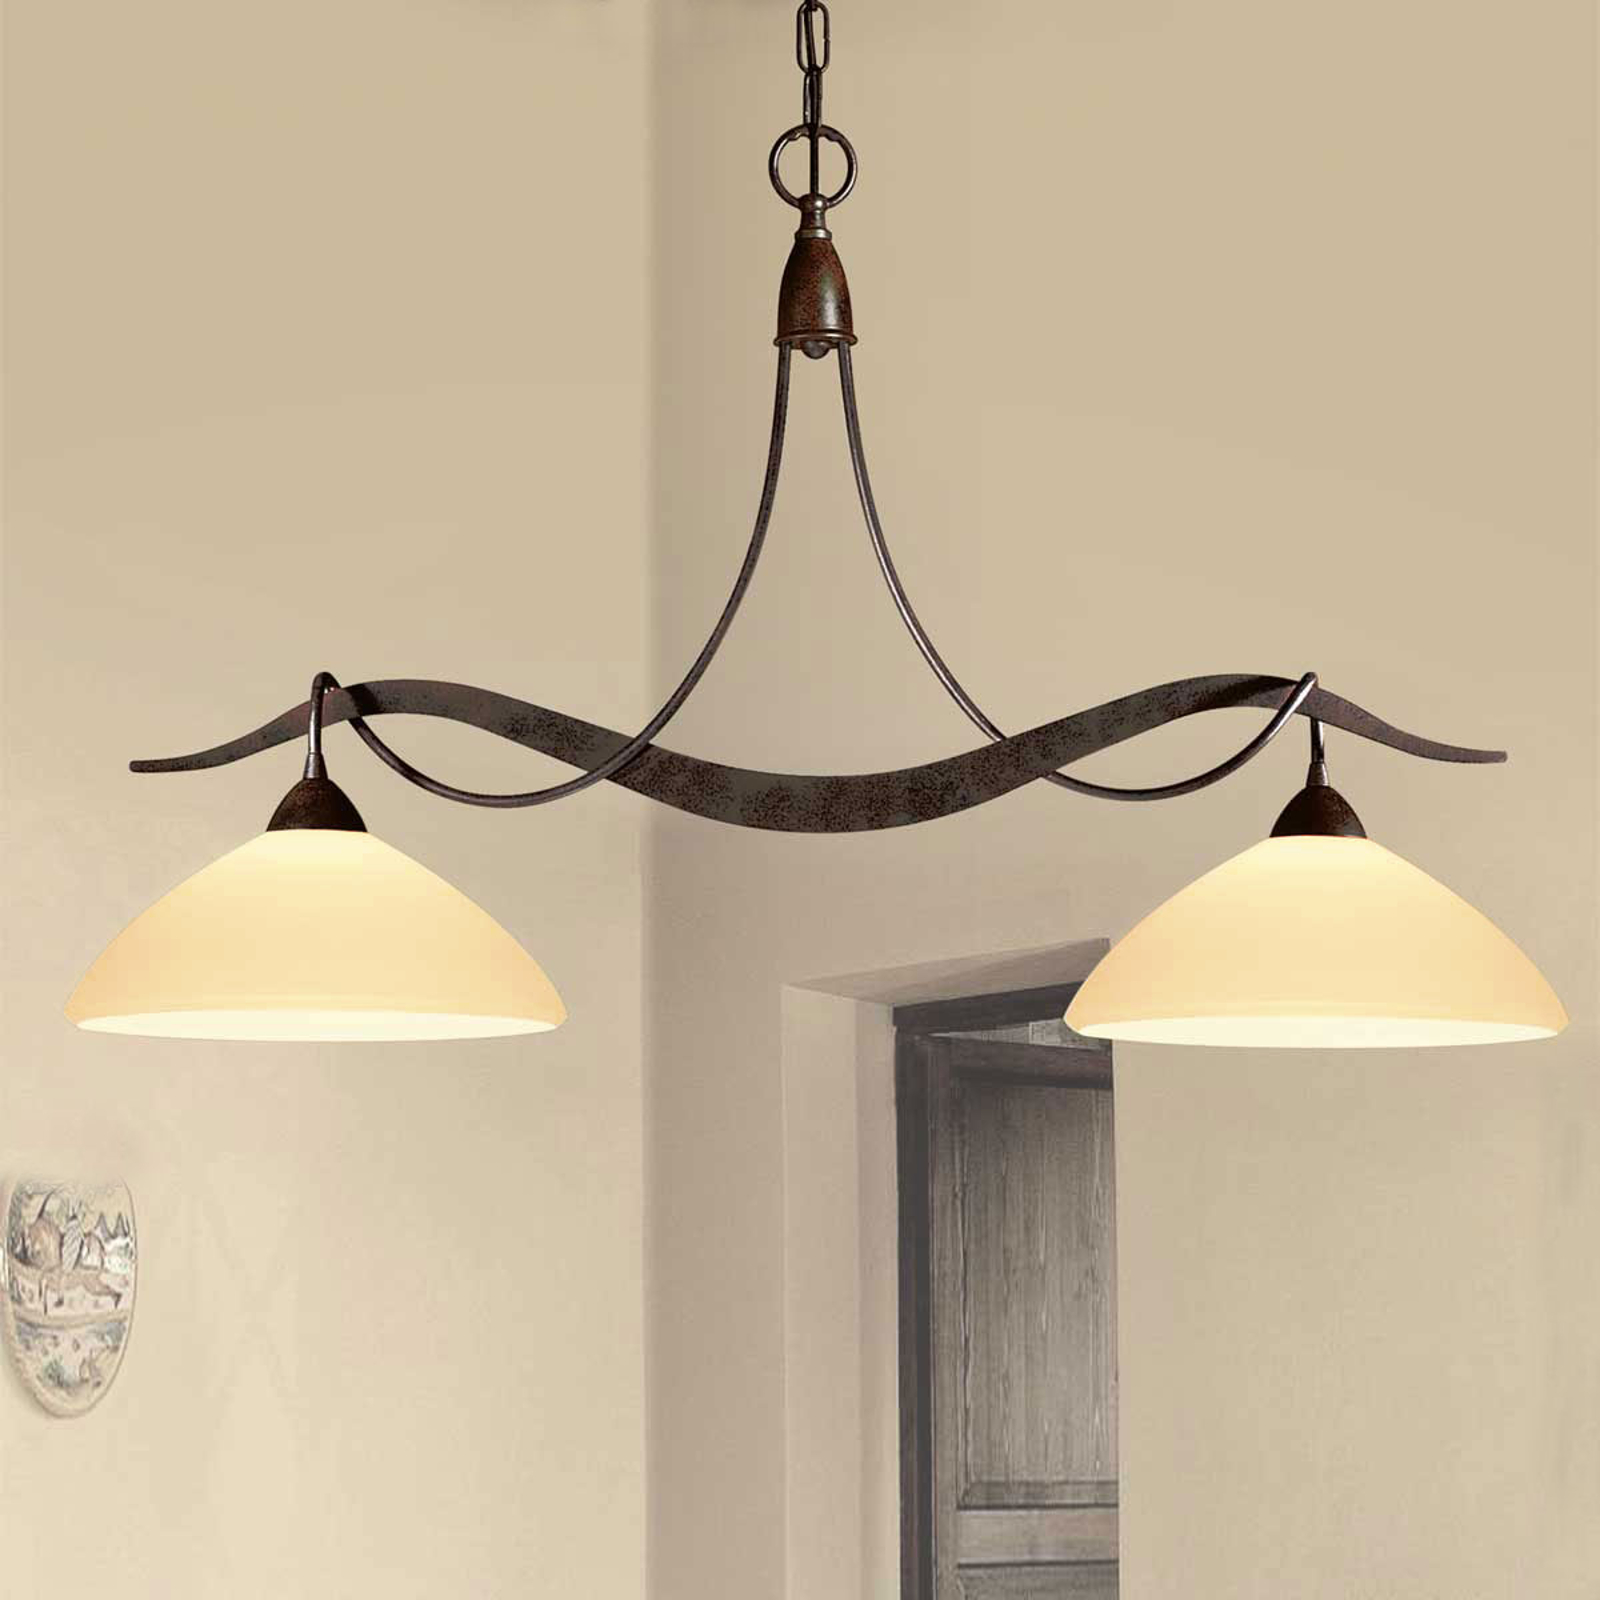 2-punktowa lampa wisząca Samuele, kremowa